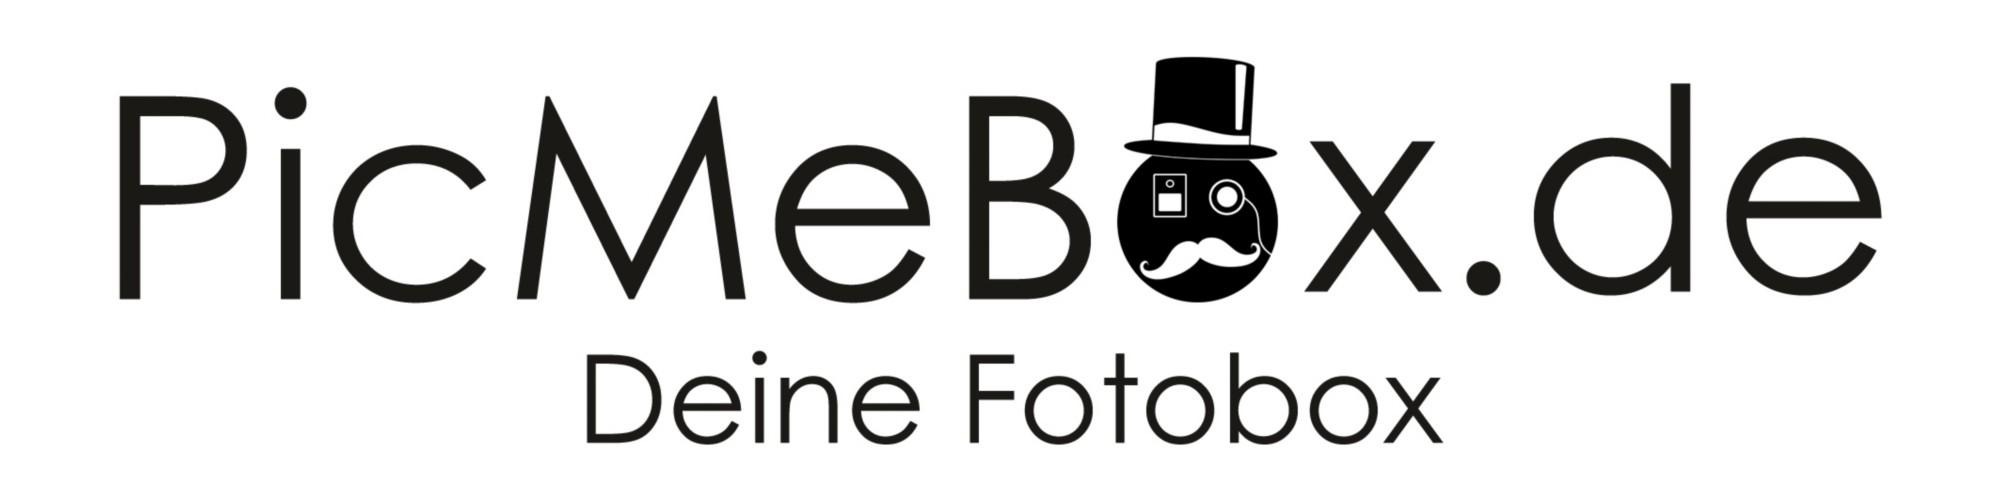 PicMeBox